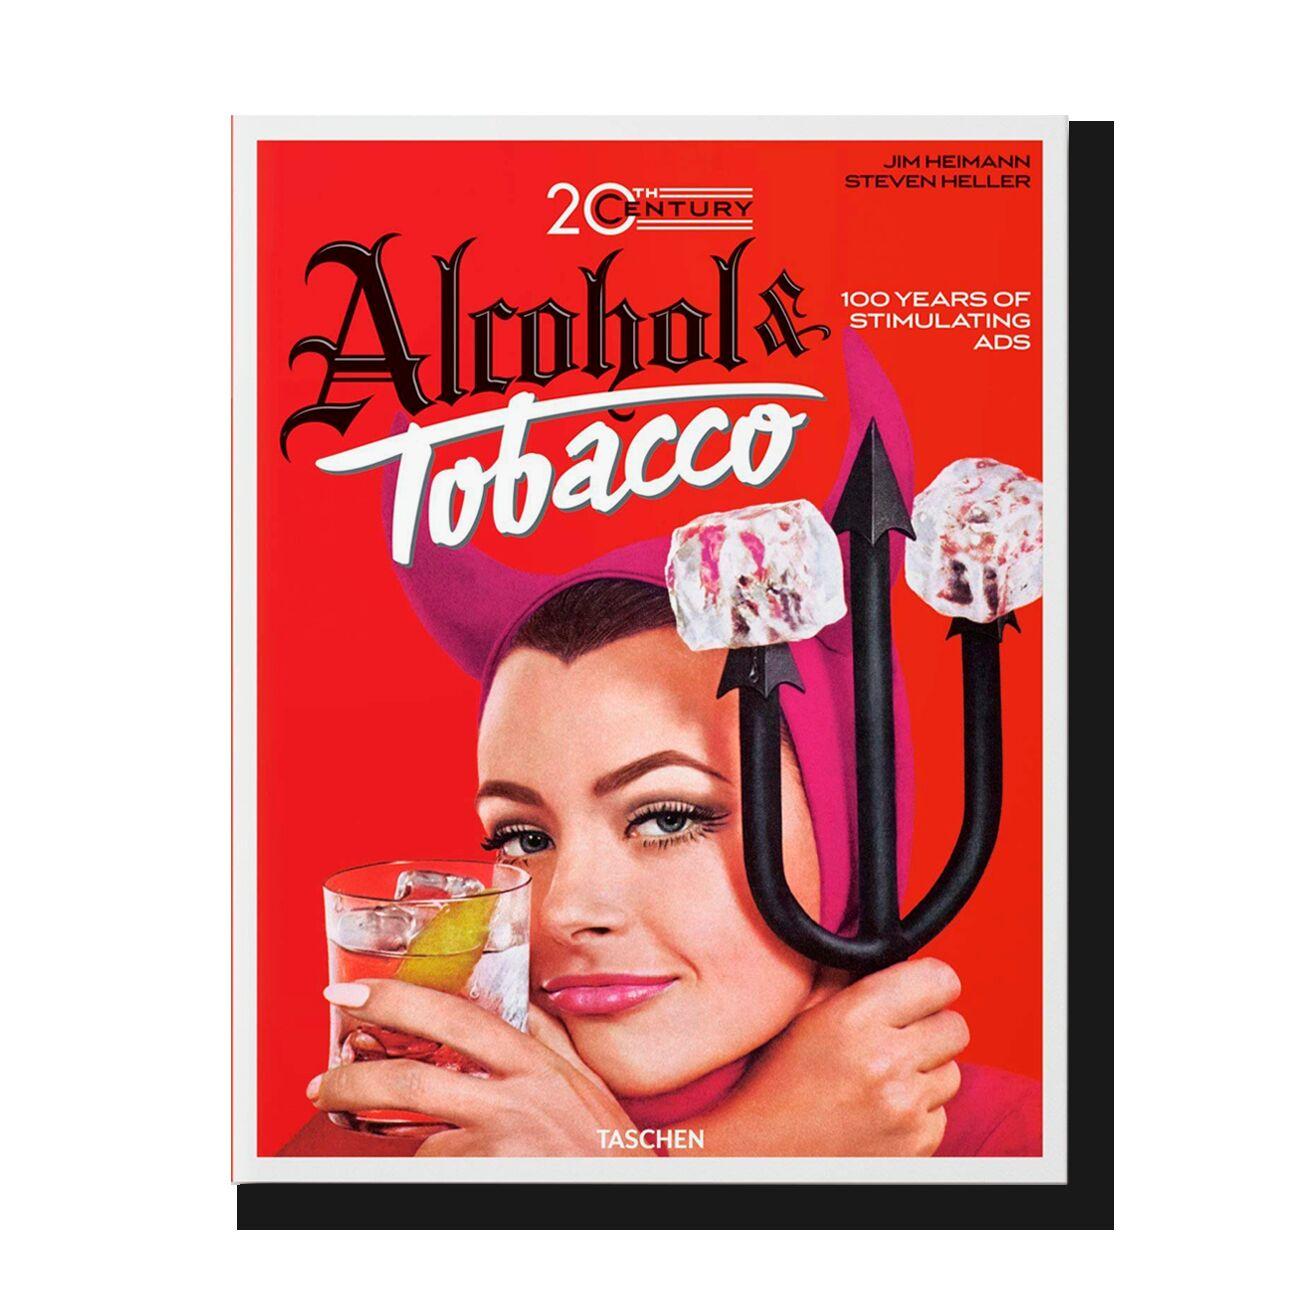 20th Century Alcohol & Tobacco Ads